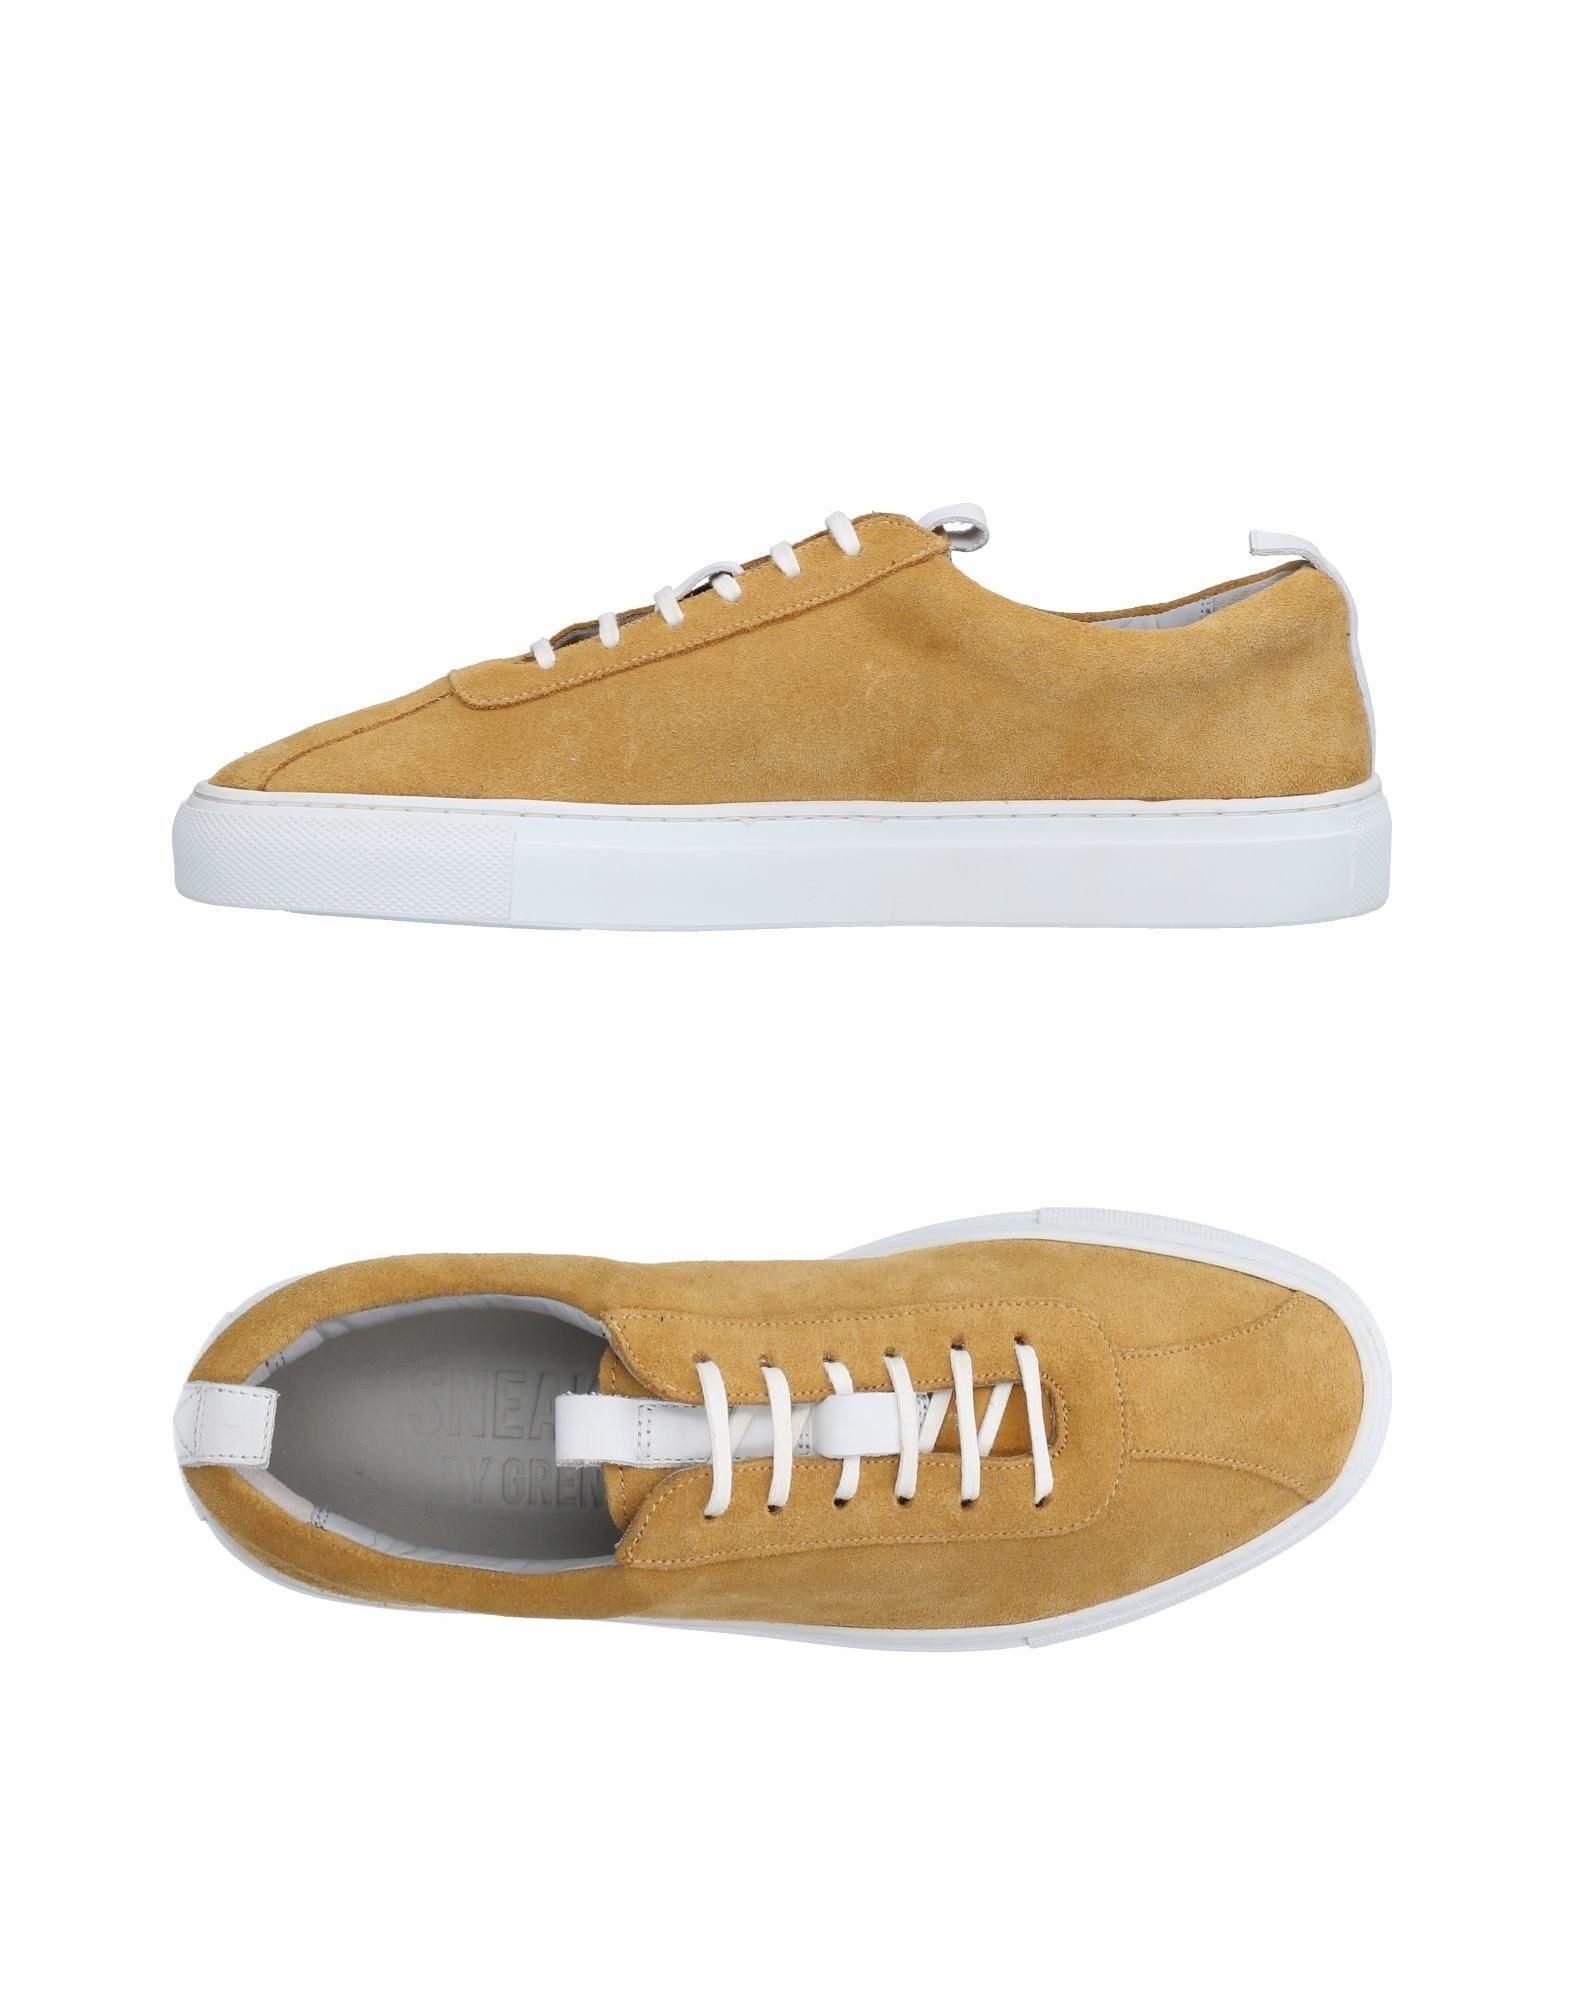 Grenson Sneakers Gute Damen  11506954AS Gute Sneakers Qualität beliebte Schuhe 25c85a